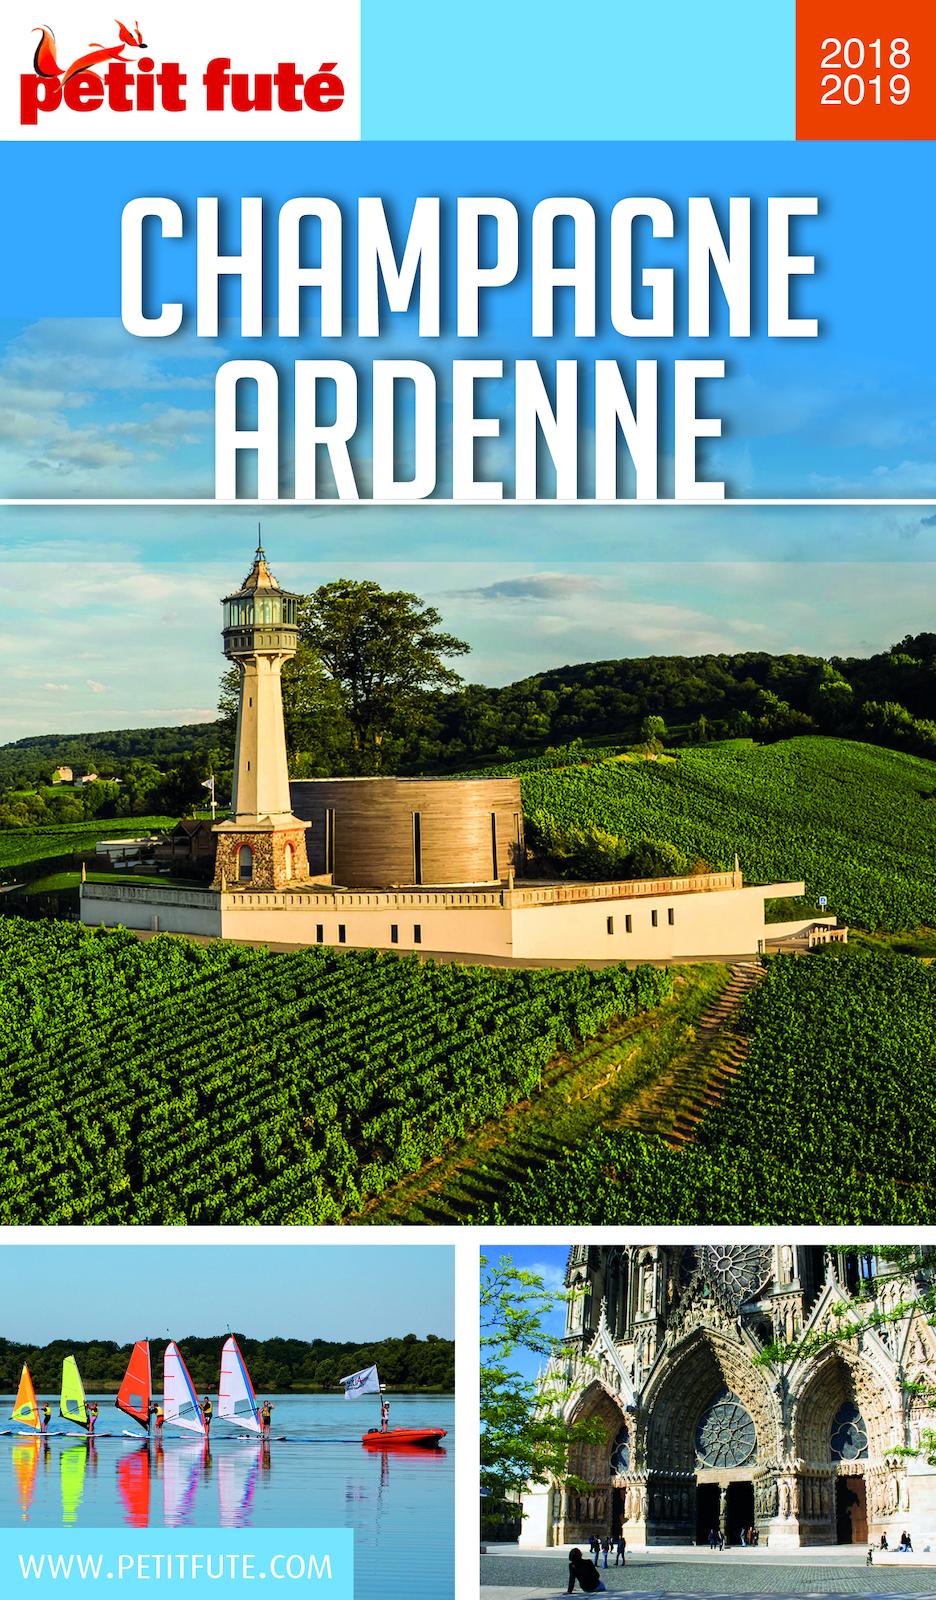 CHAMPAGNE-ARDENNE 2019 Peti...